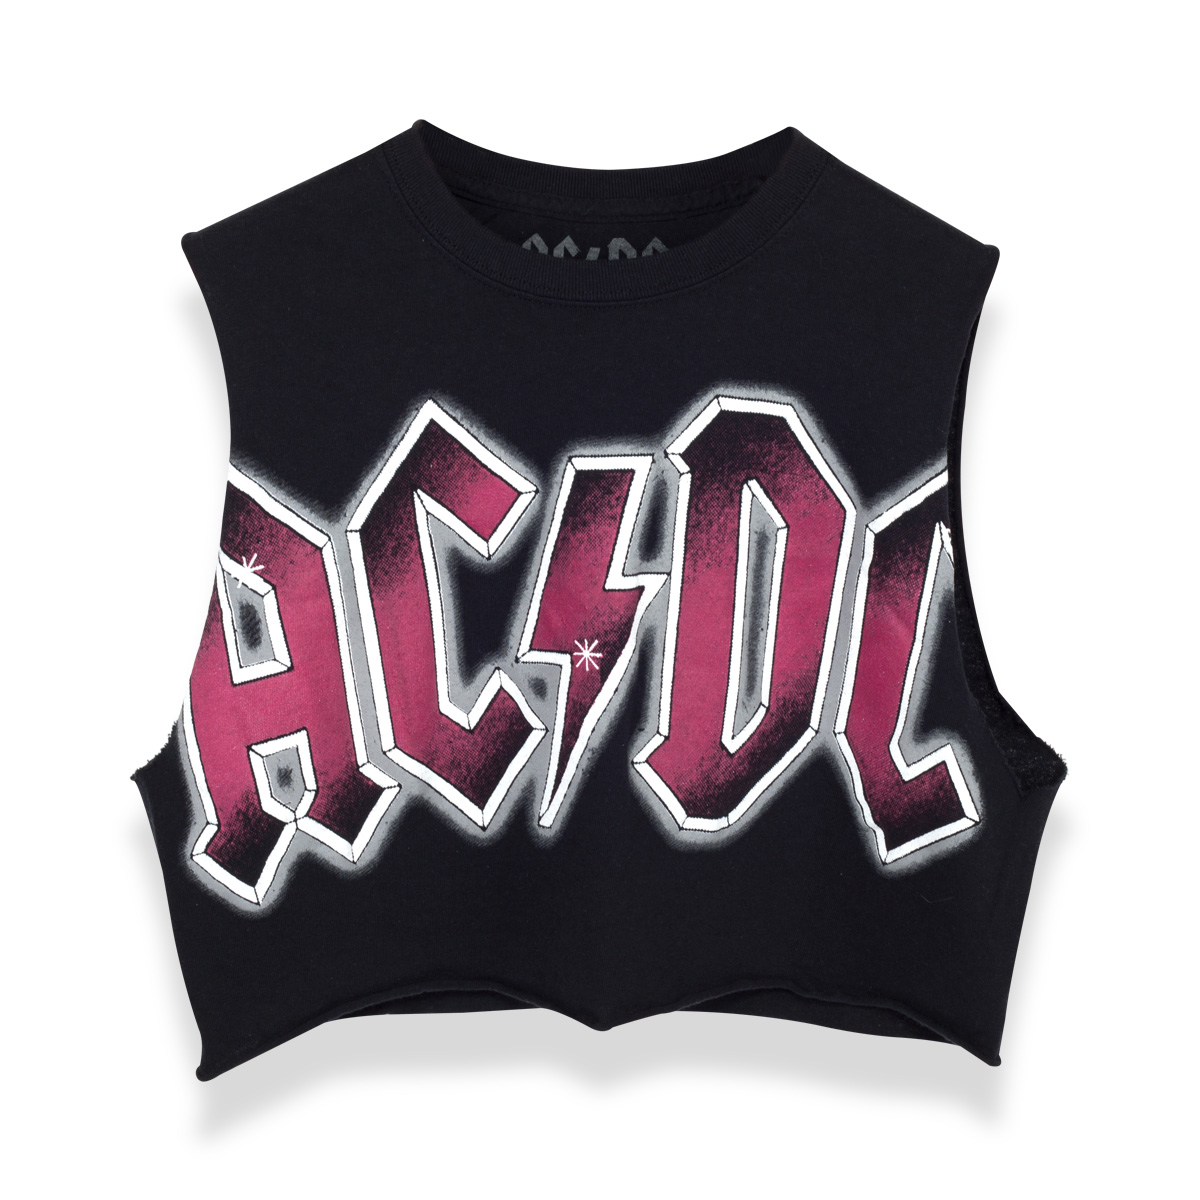 AC/DC Crop Top - Black